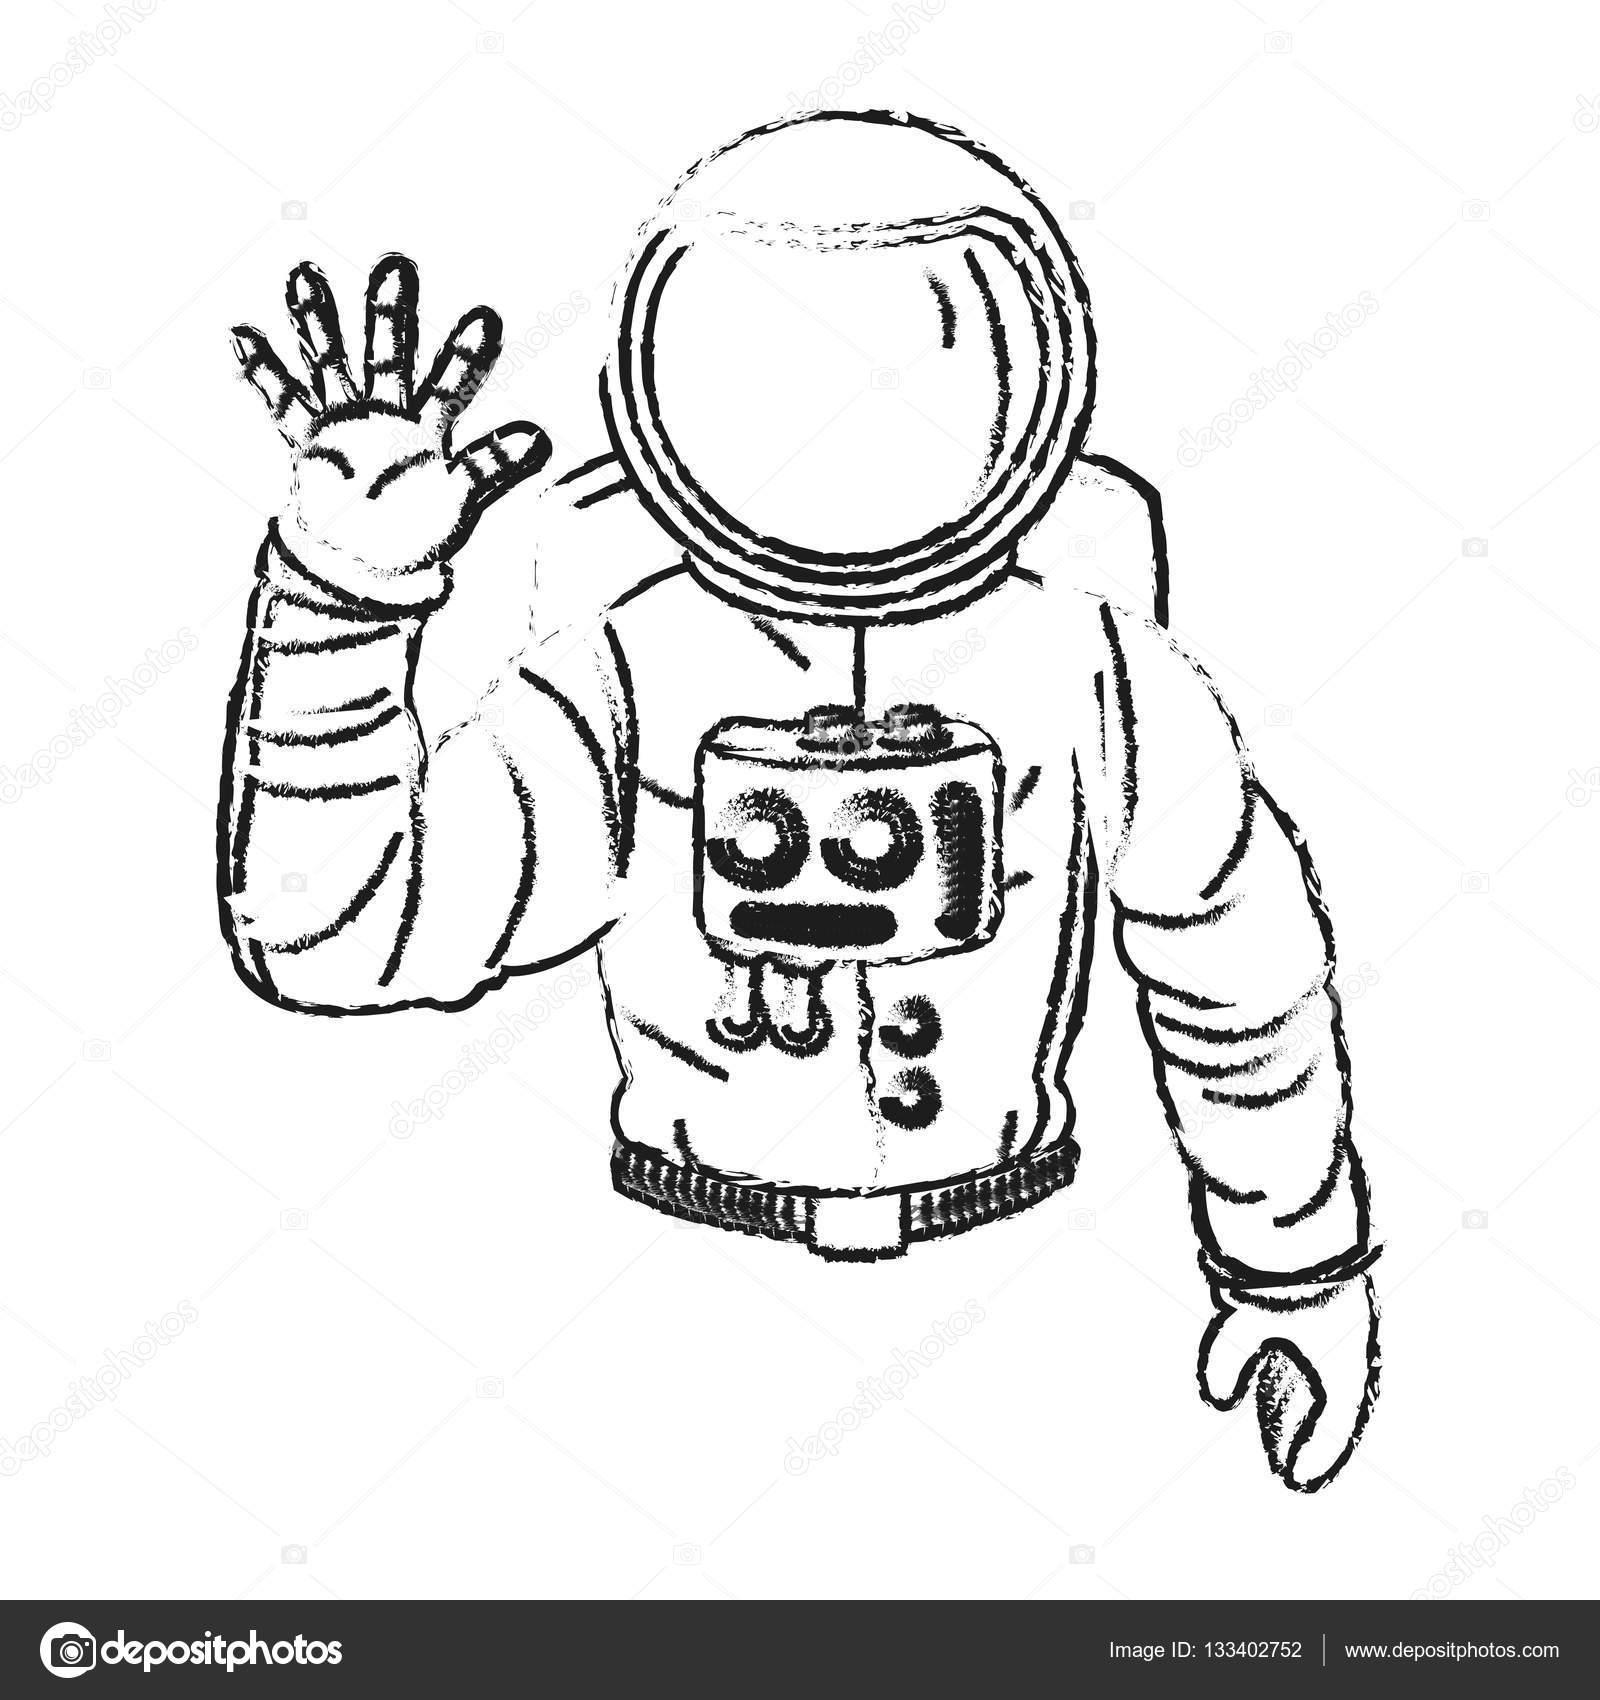 Dise O De Dibujos Animados De Astronautas Aislados